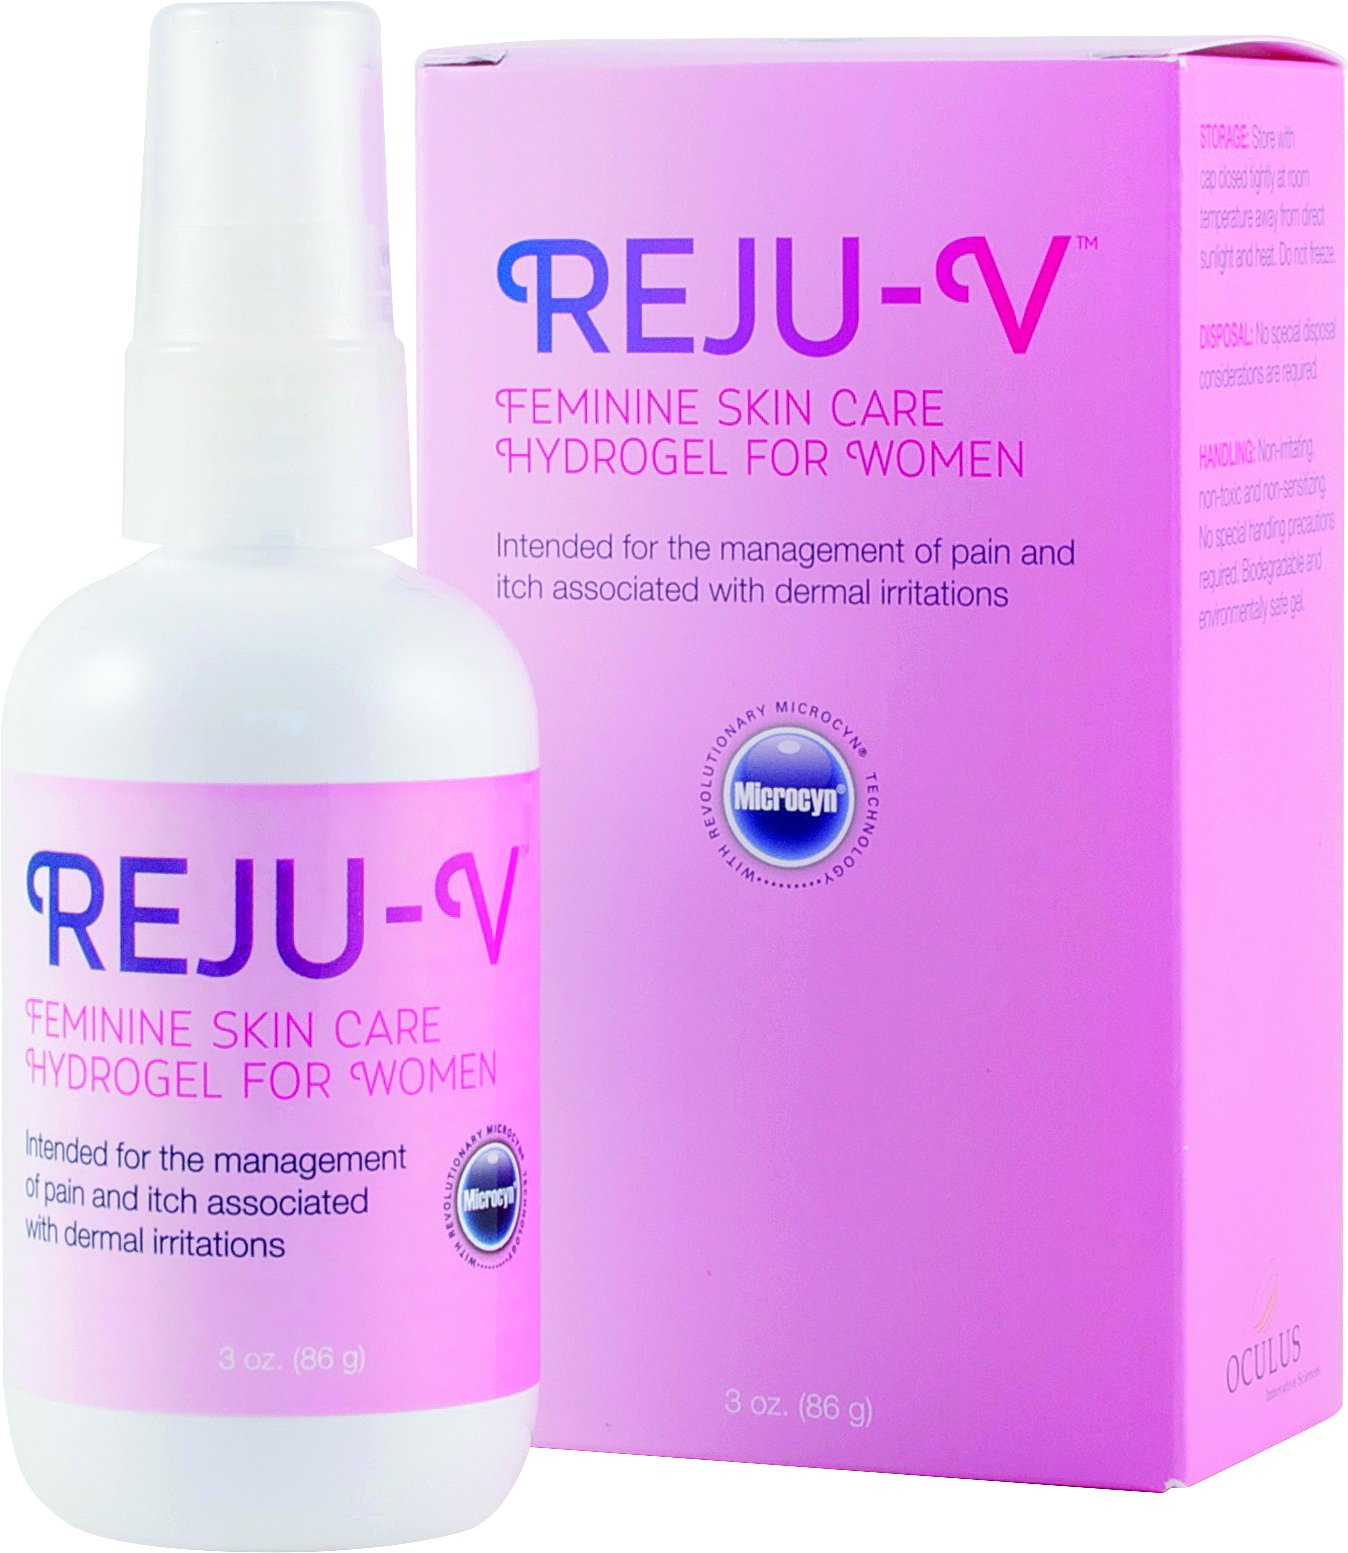 Reju-V Feminine Skin Care HydroGel for Women